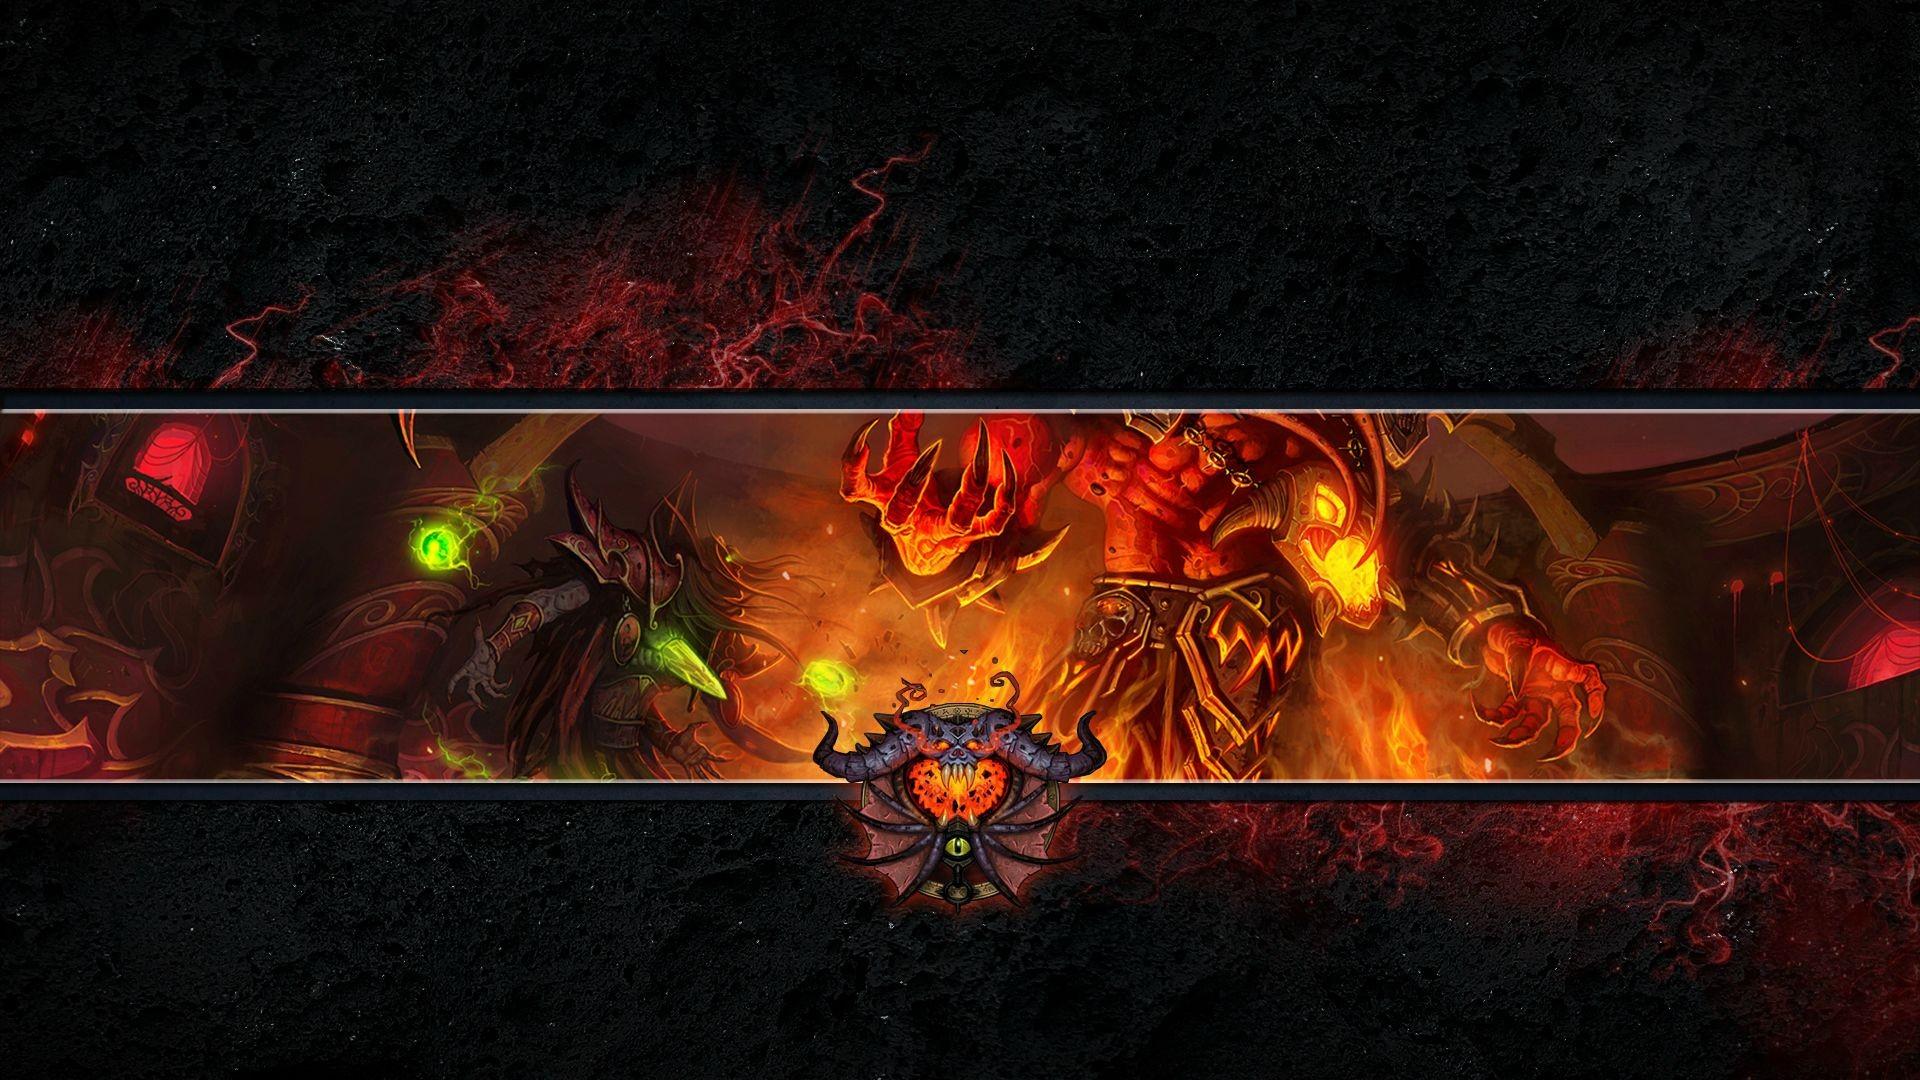 wallpaper : video games, world of warcraft, warlock, darkness